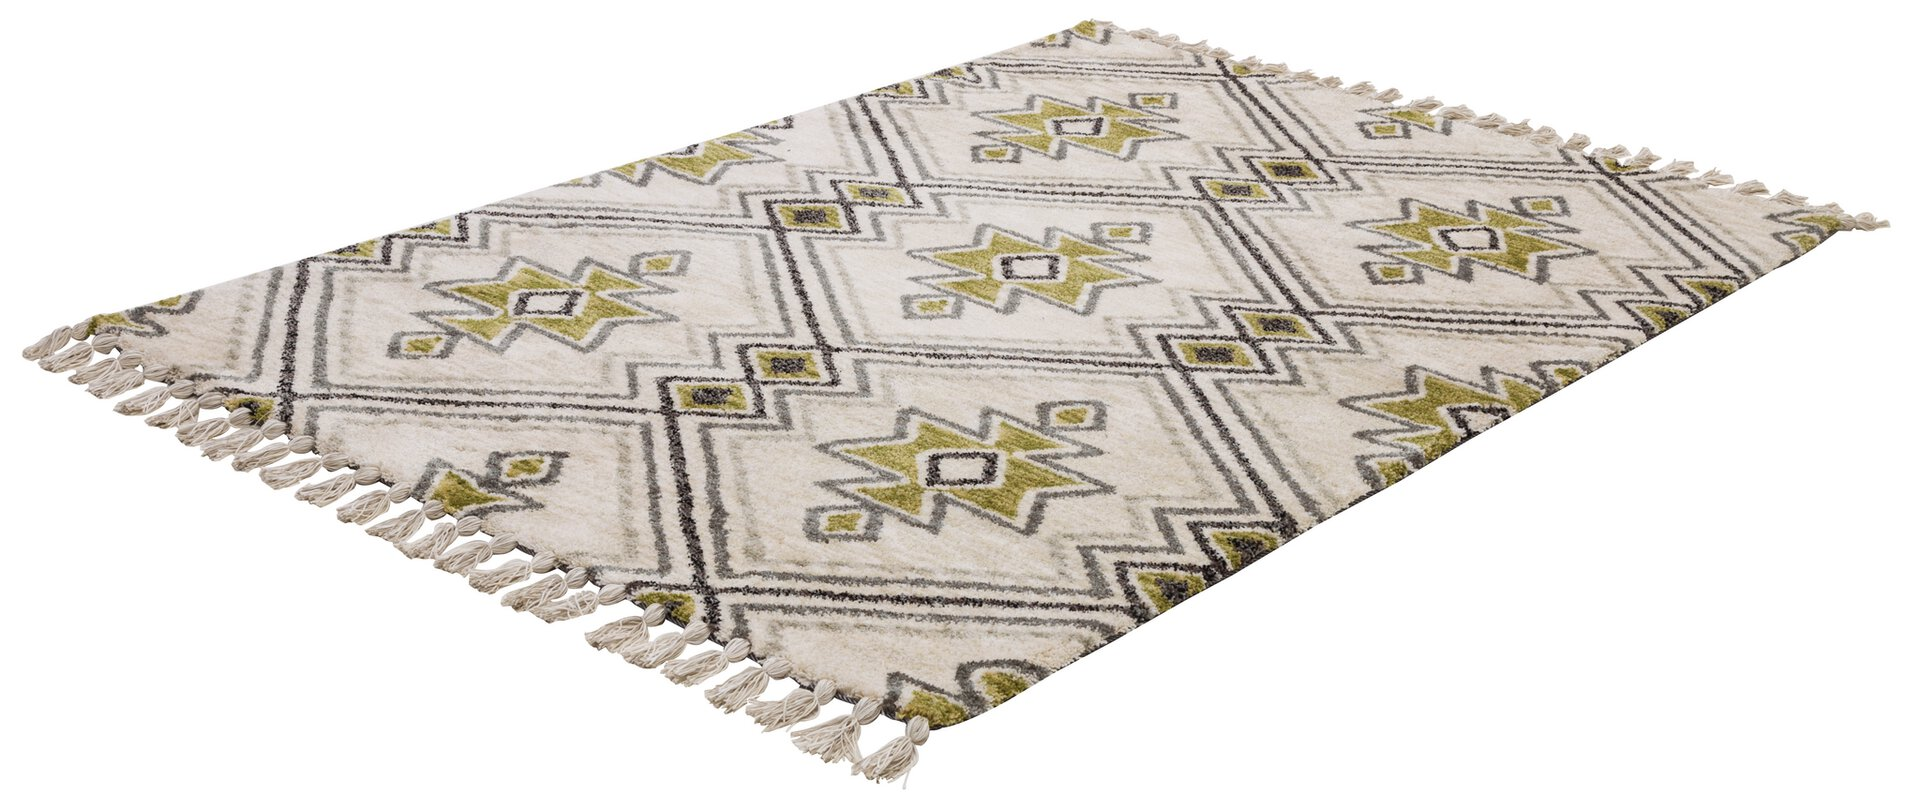 Handtuftteppich Vittoria Gino Falcone Textil grün 1 x 2 cm